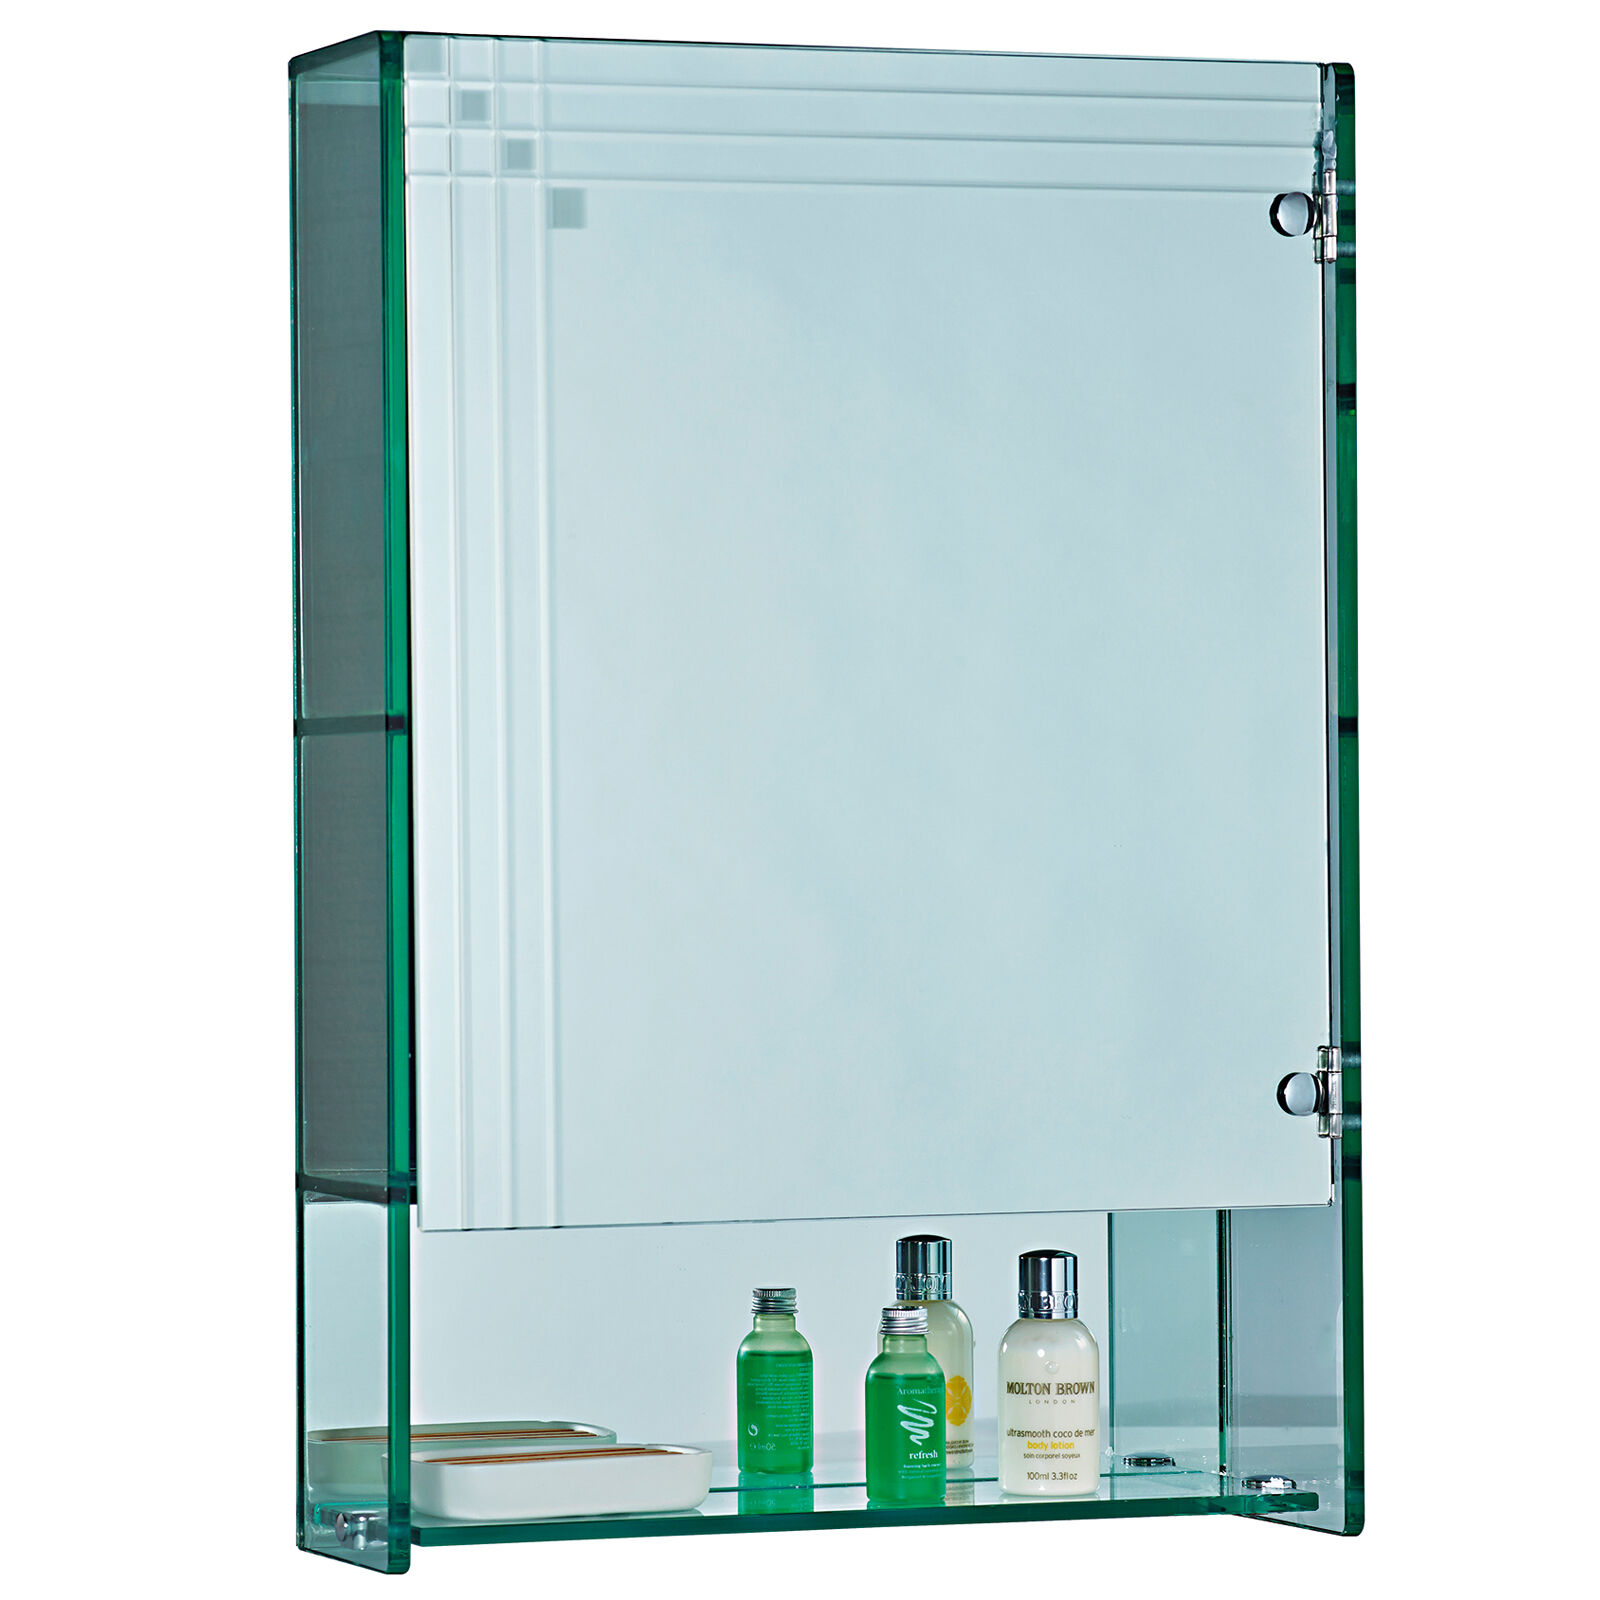 Marratimo glass wall mounted mirrored bathroom cabinet - Wall mounted mirrored bathroom cabinet ...